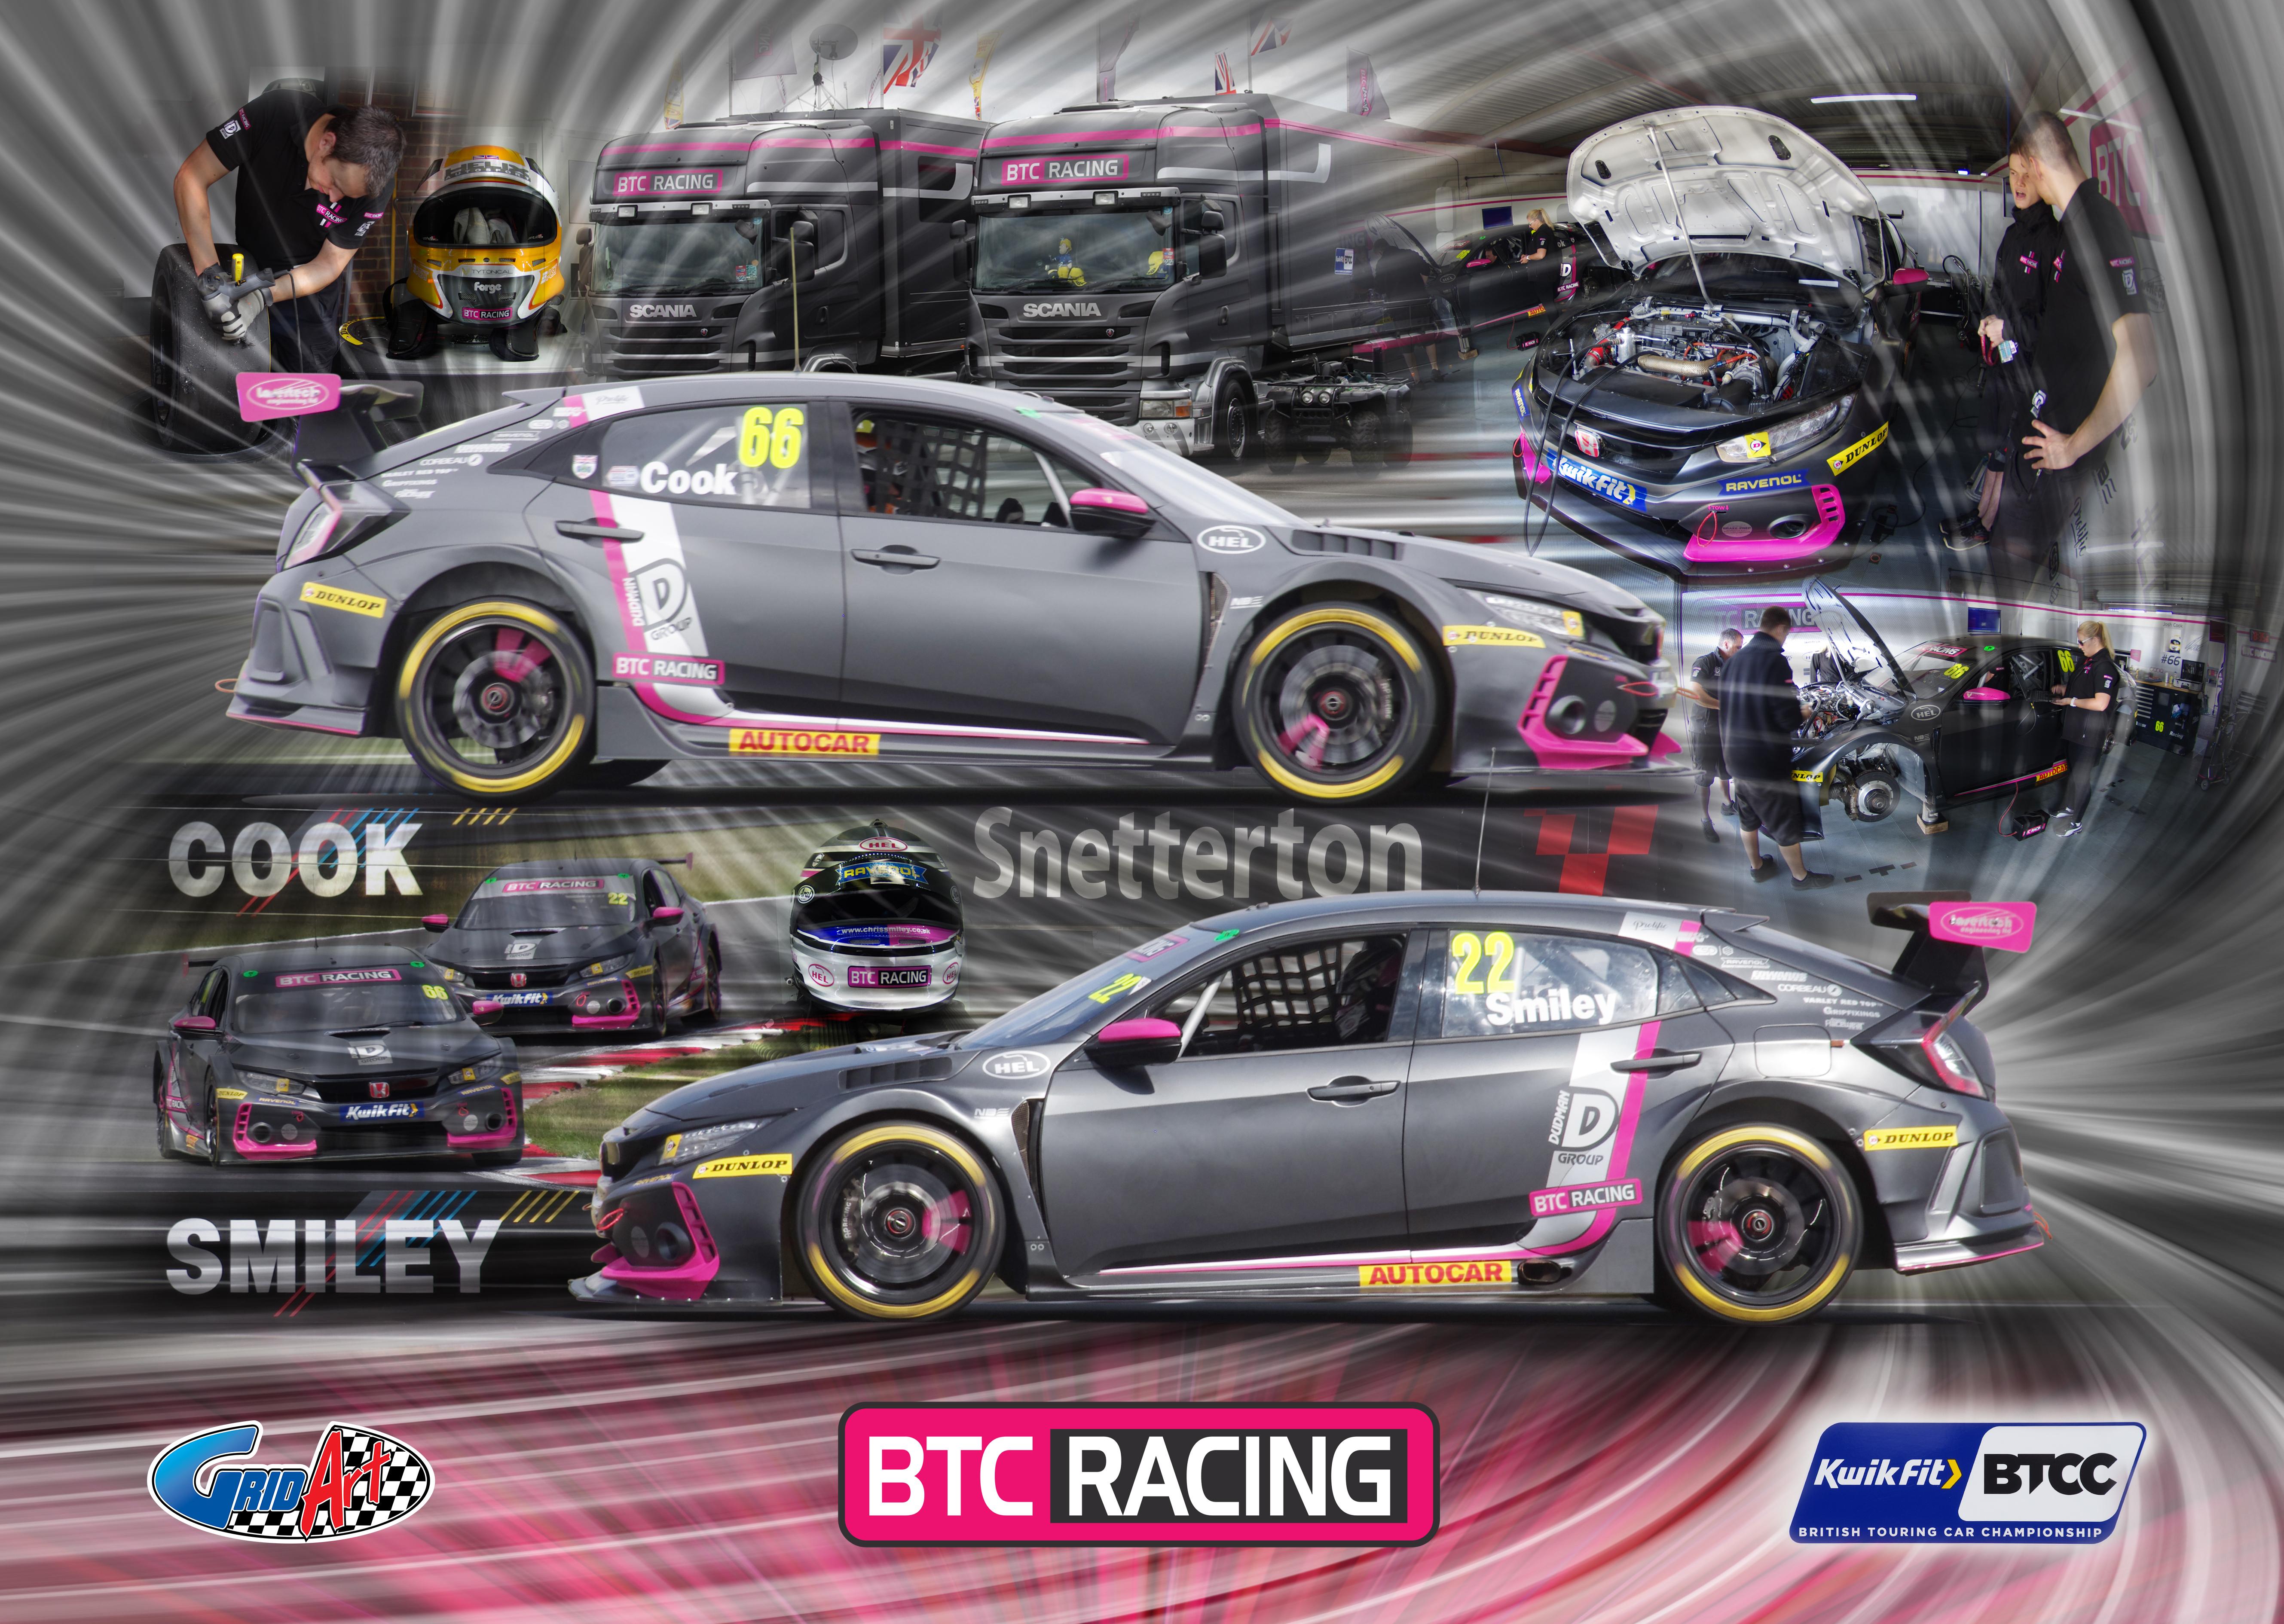 BTC Racing - BTCC 2019